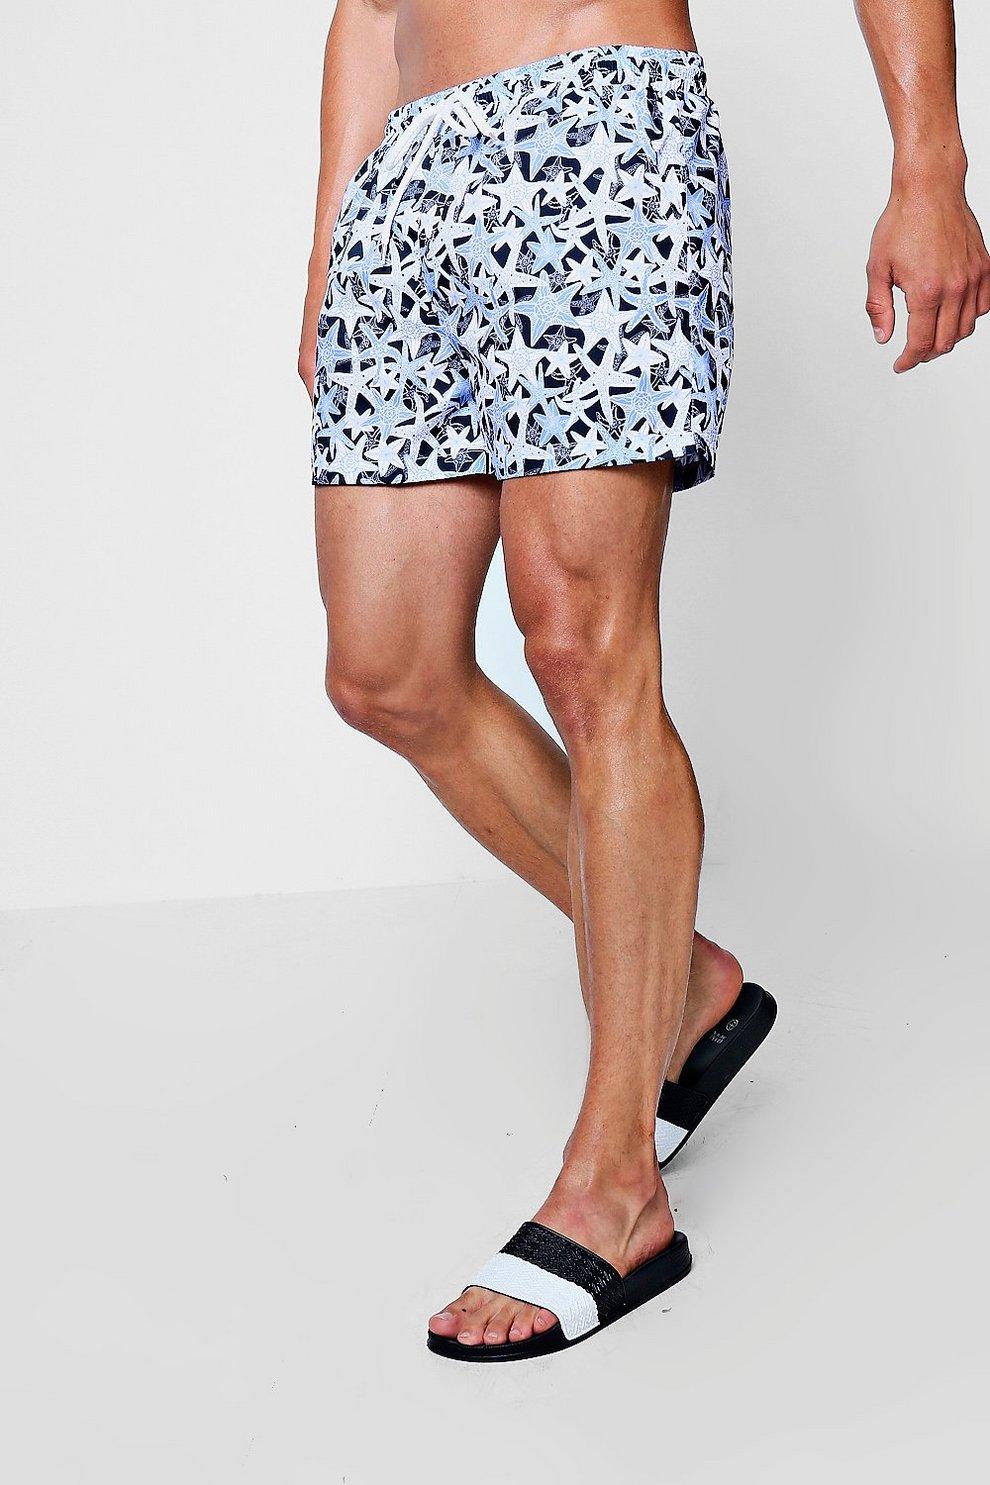 Bain Long MerBoohoo Shorts Étoile De Imprimé À EDHb9YIeW2